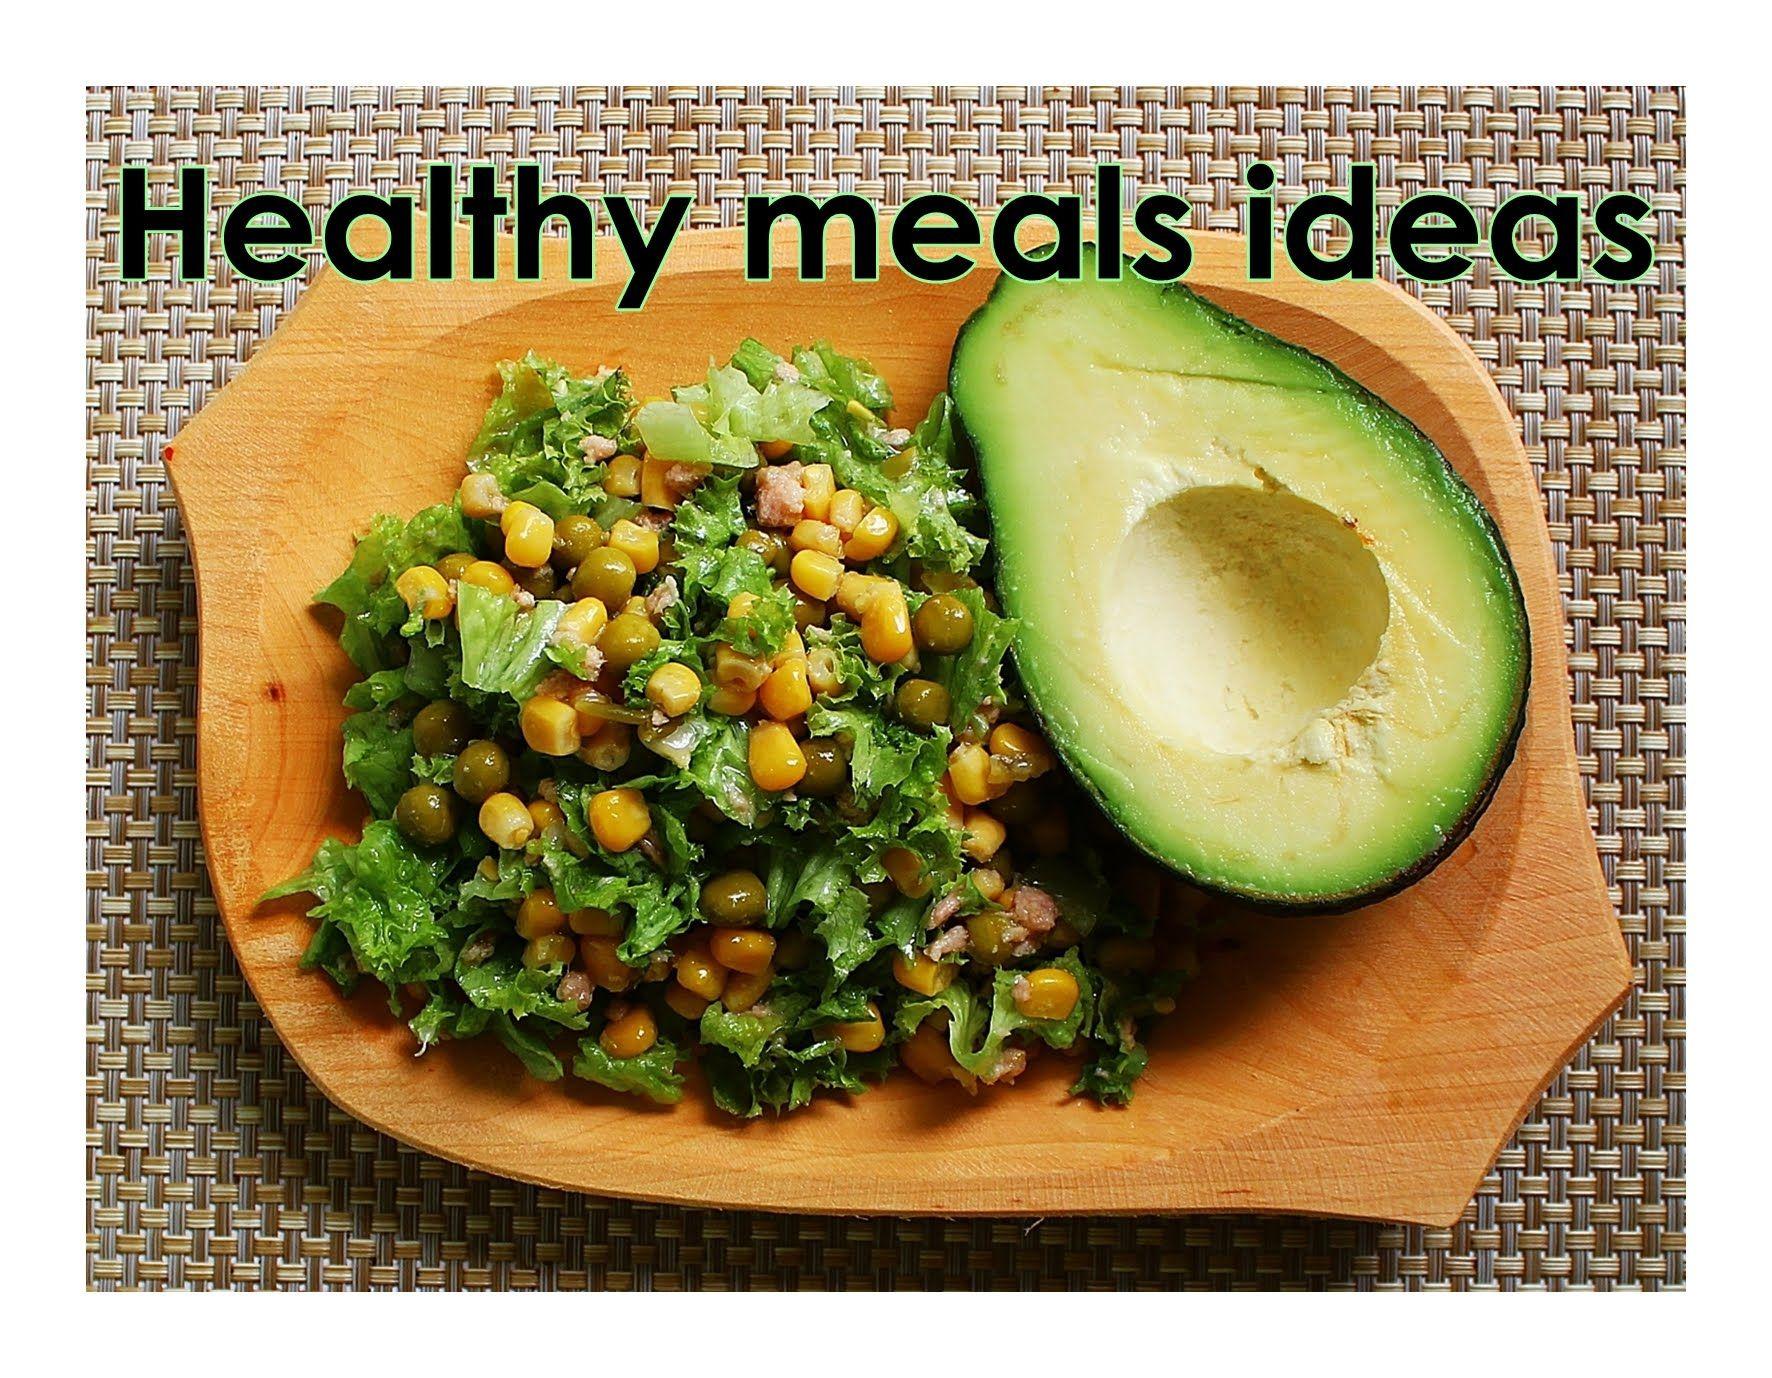 Healthy meals ideas 1 food pinterest meal ideas meals and healthy meals ideas 1 forumfinder Images